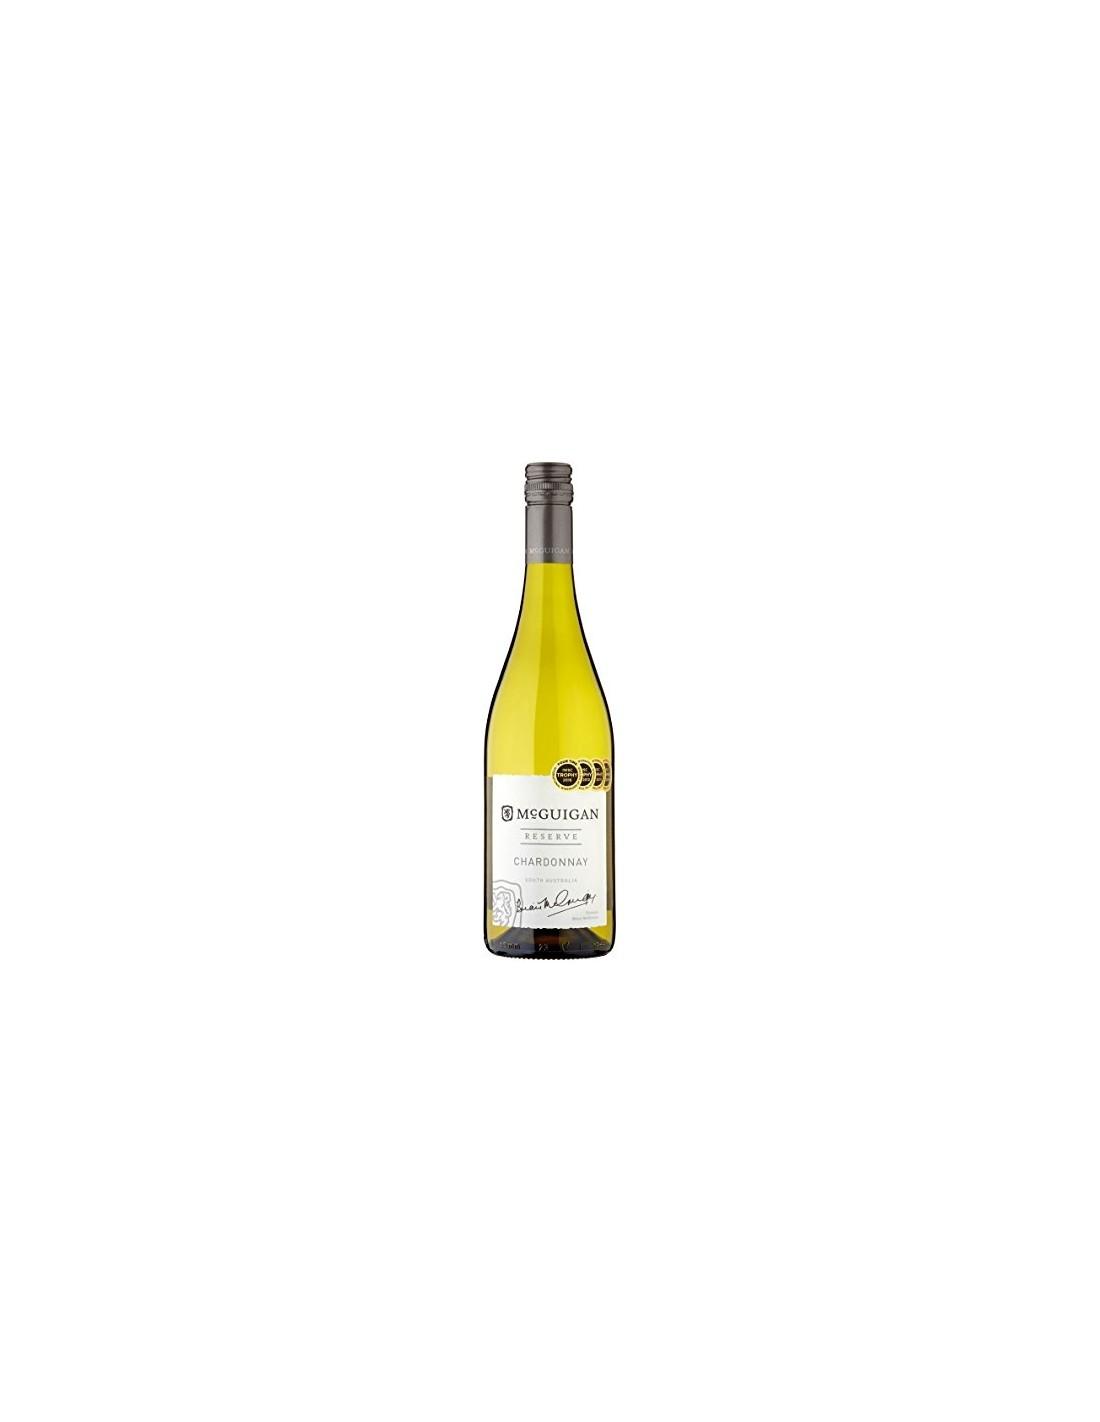 Vin alb, Chardonnay, McGuigan, 0.75L, 12.5% alc., Australia